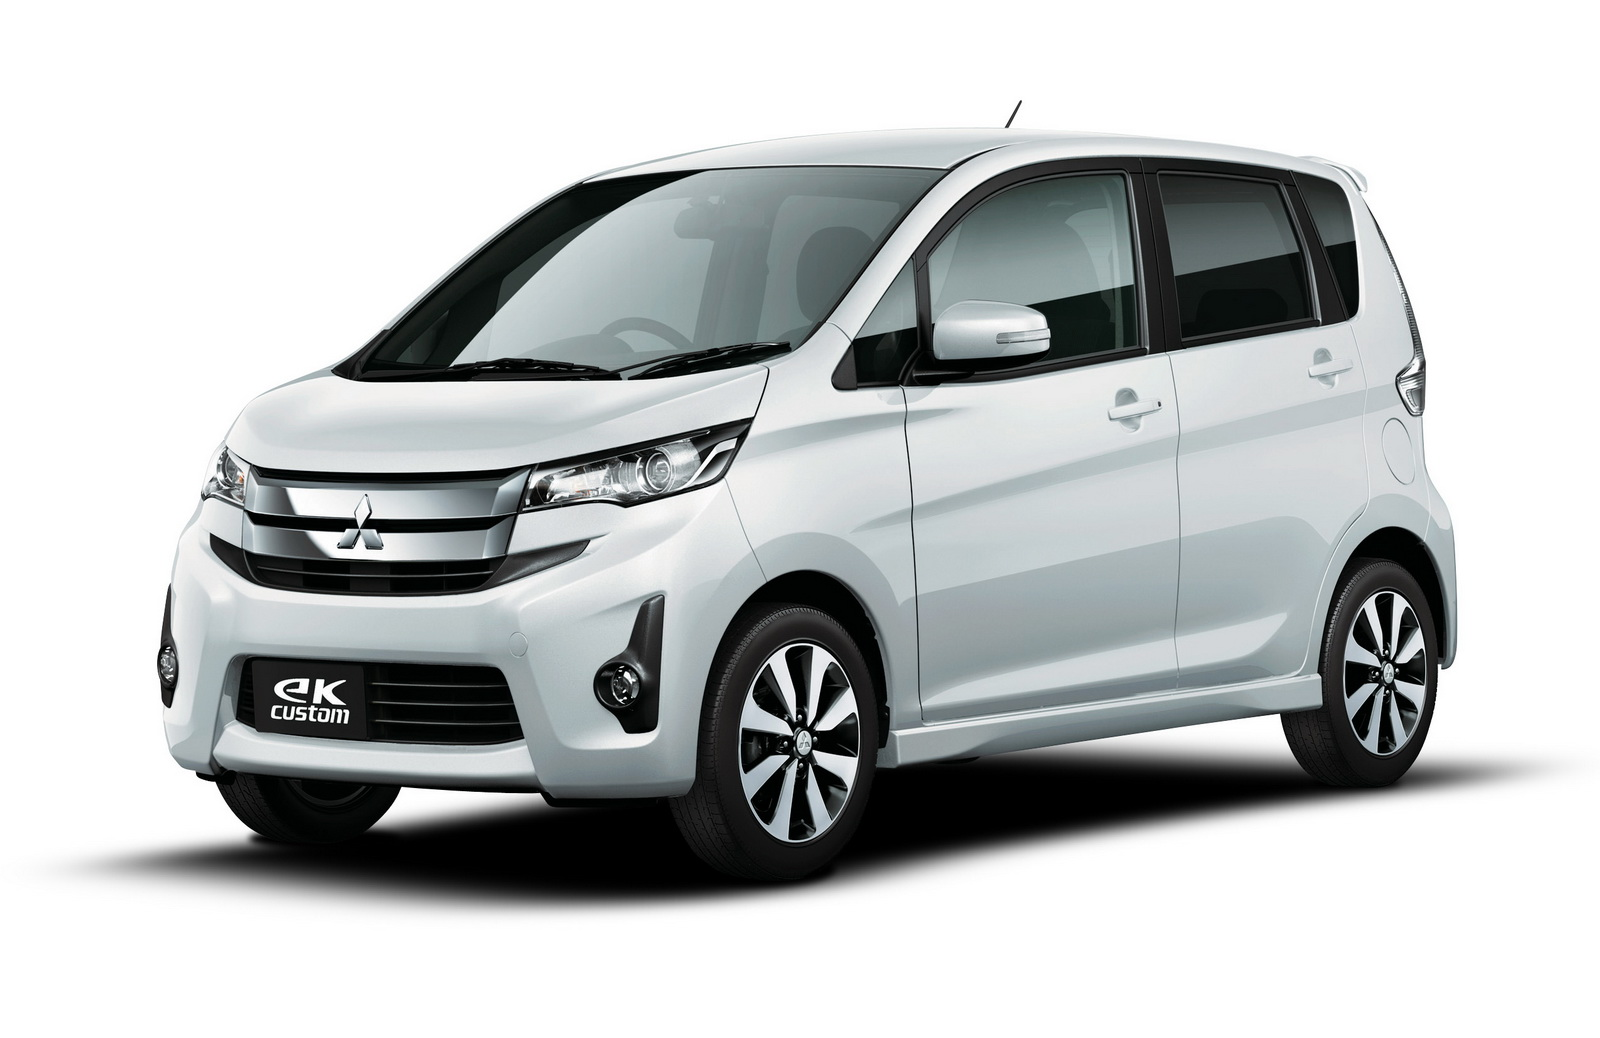 mitsubishi motors launches all new ek wagon ek custom